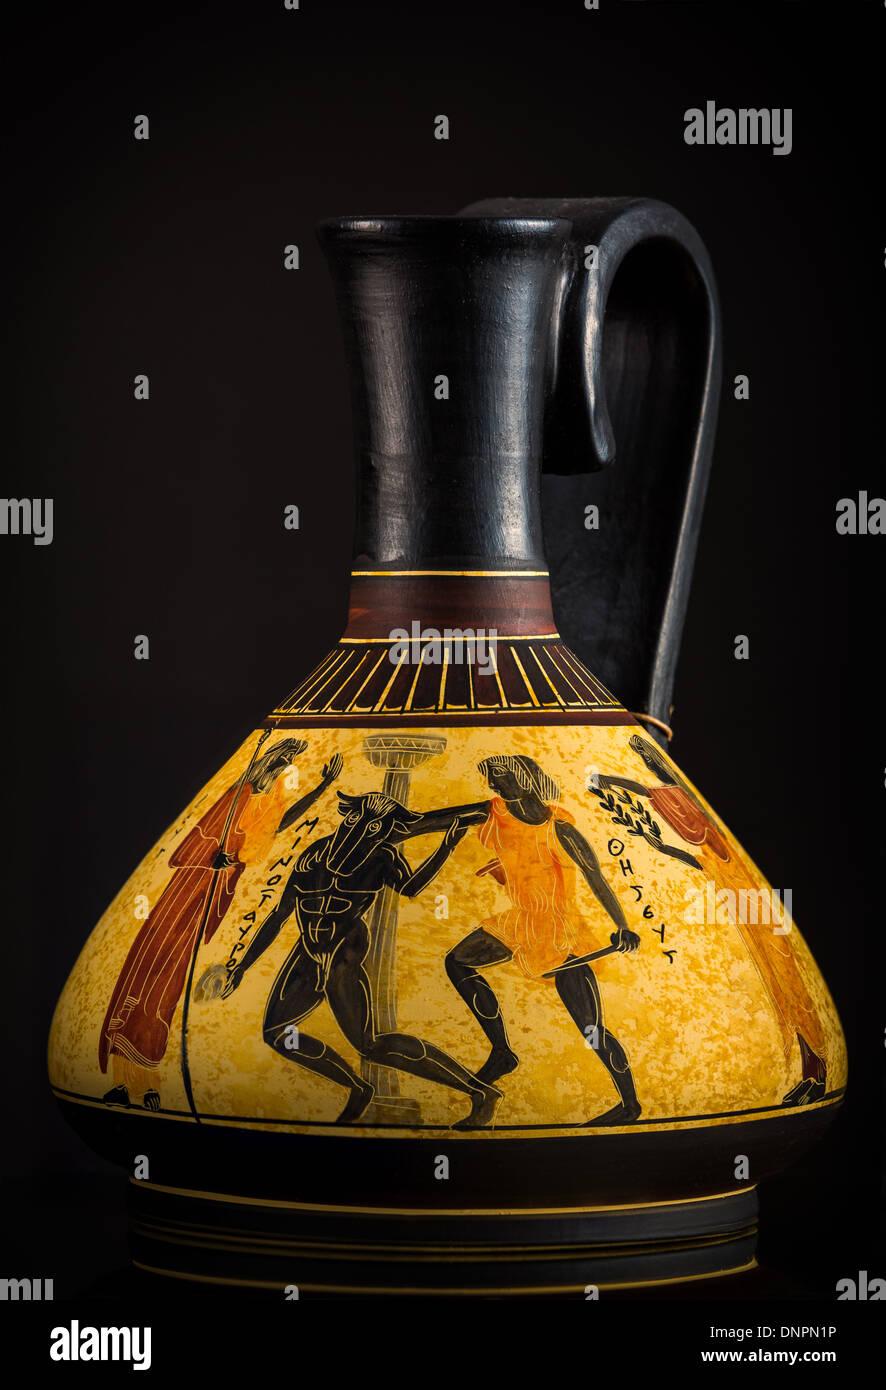 Ancient Greek vase sold as a souvenir in Crete - Stock Image